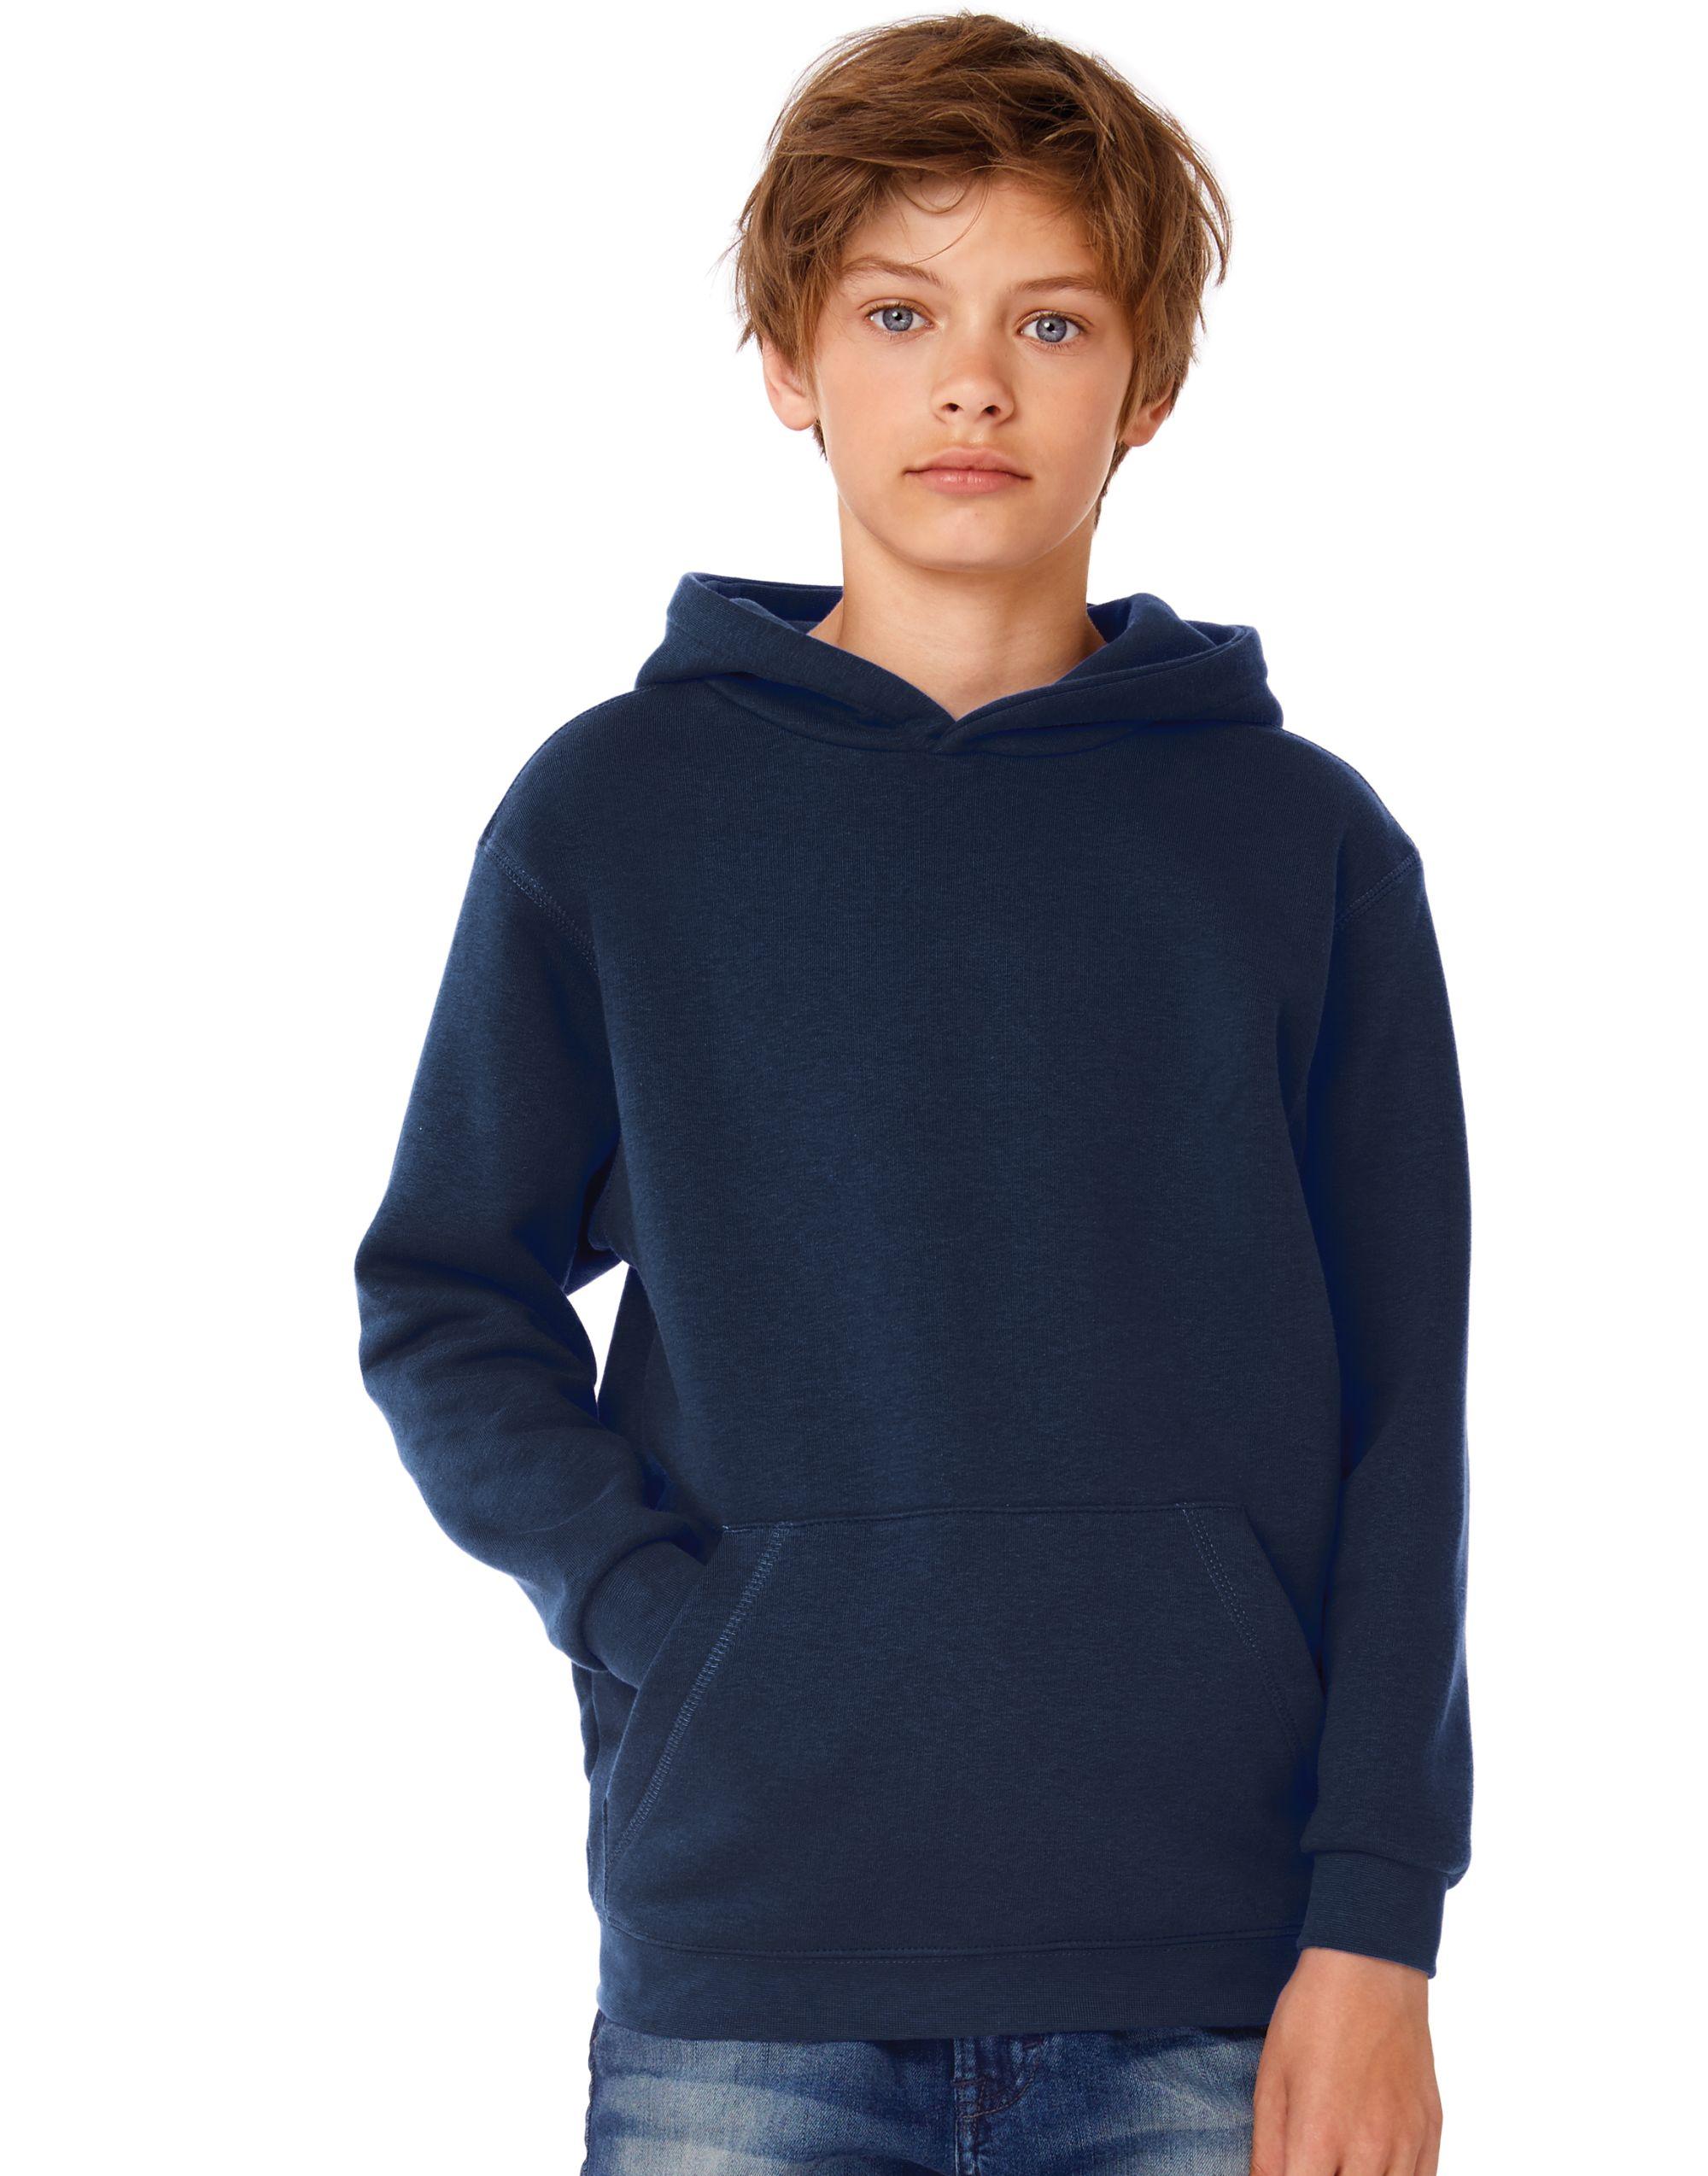 B&C Hooded Kid's Sweatshirt